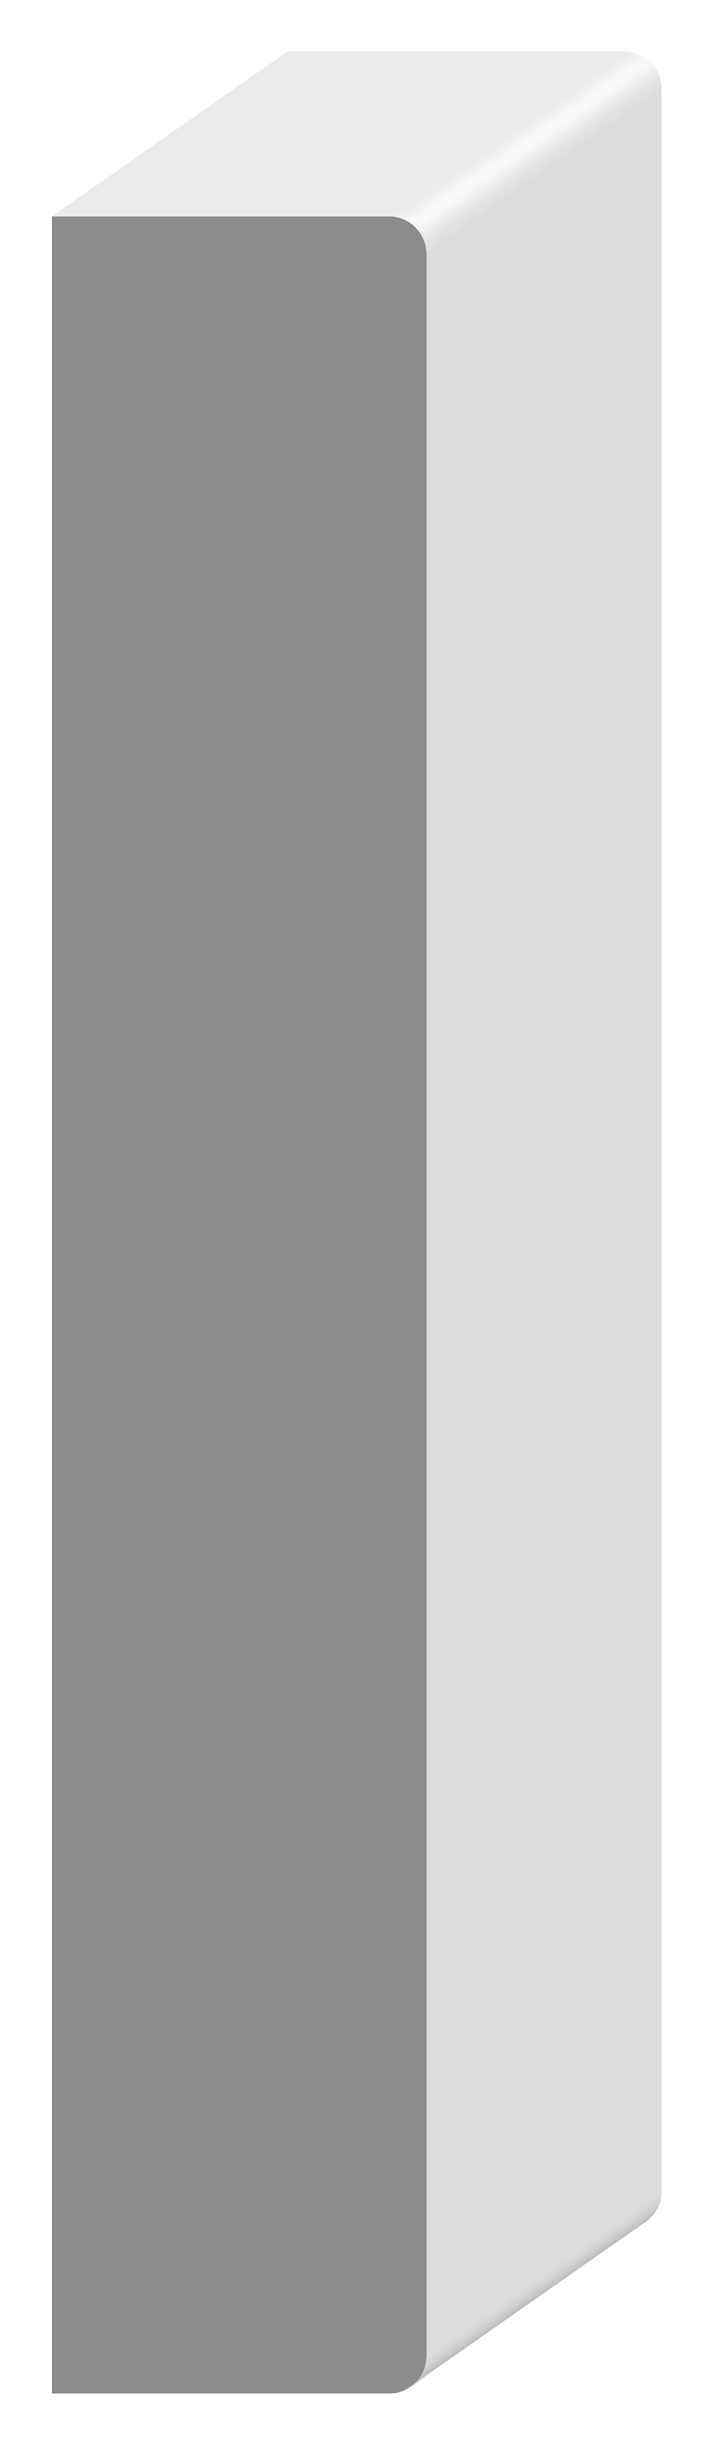 H907.25